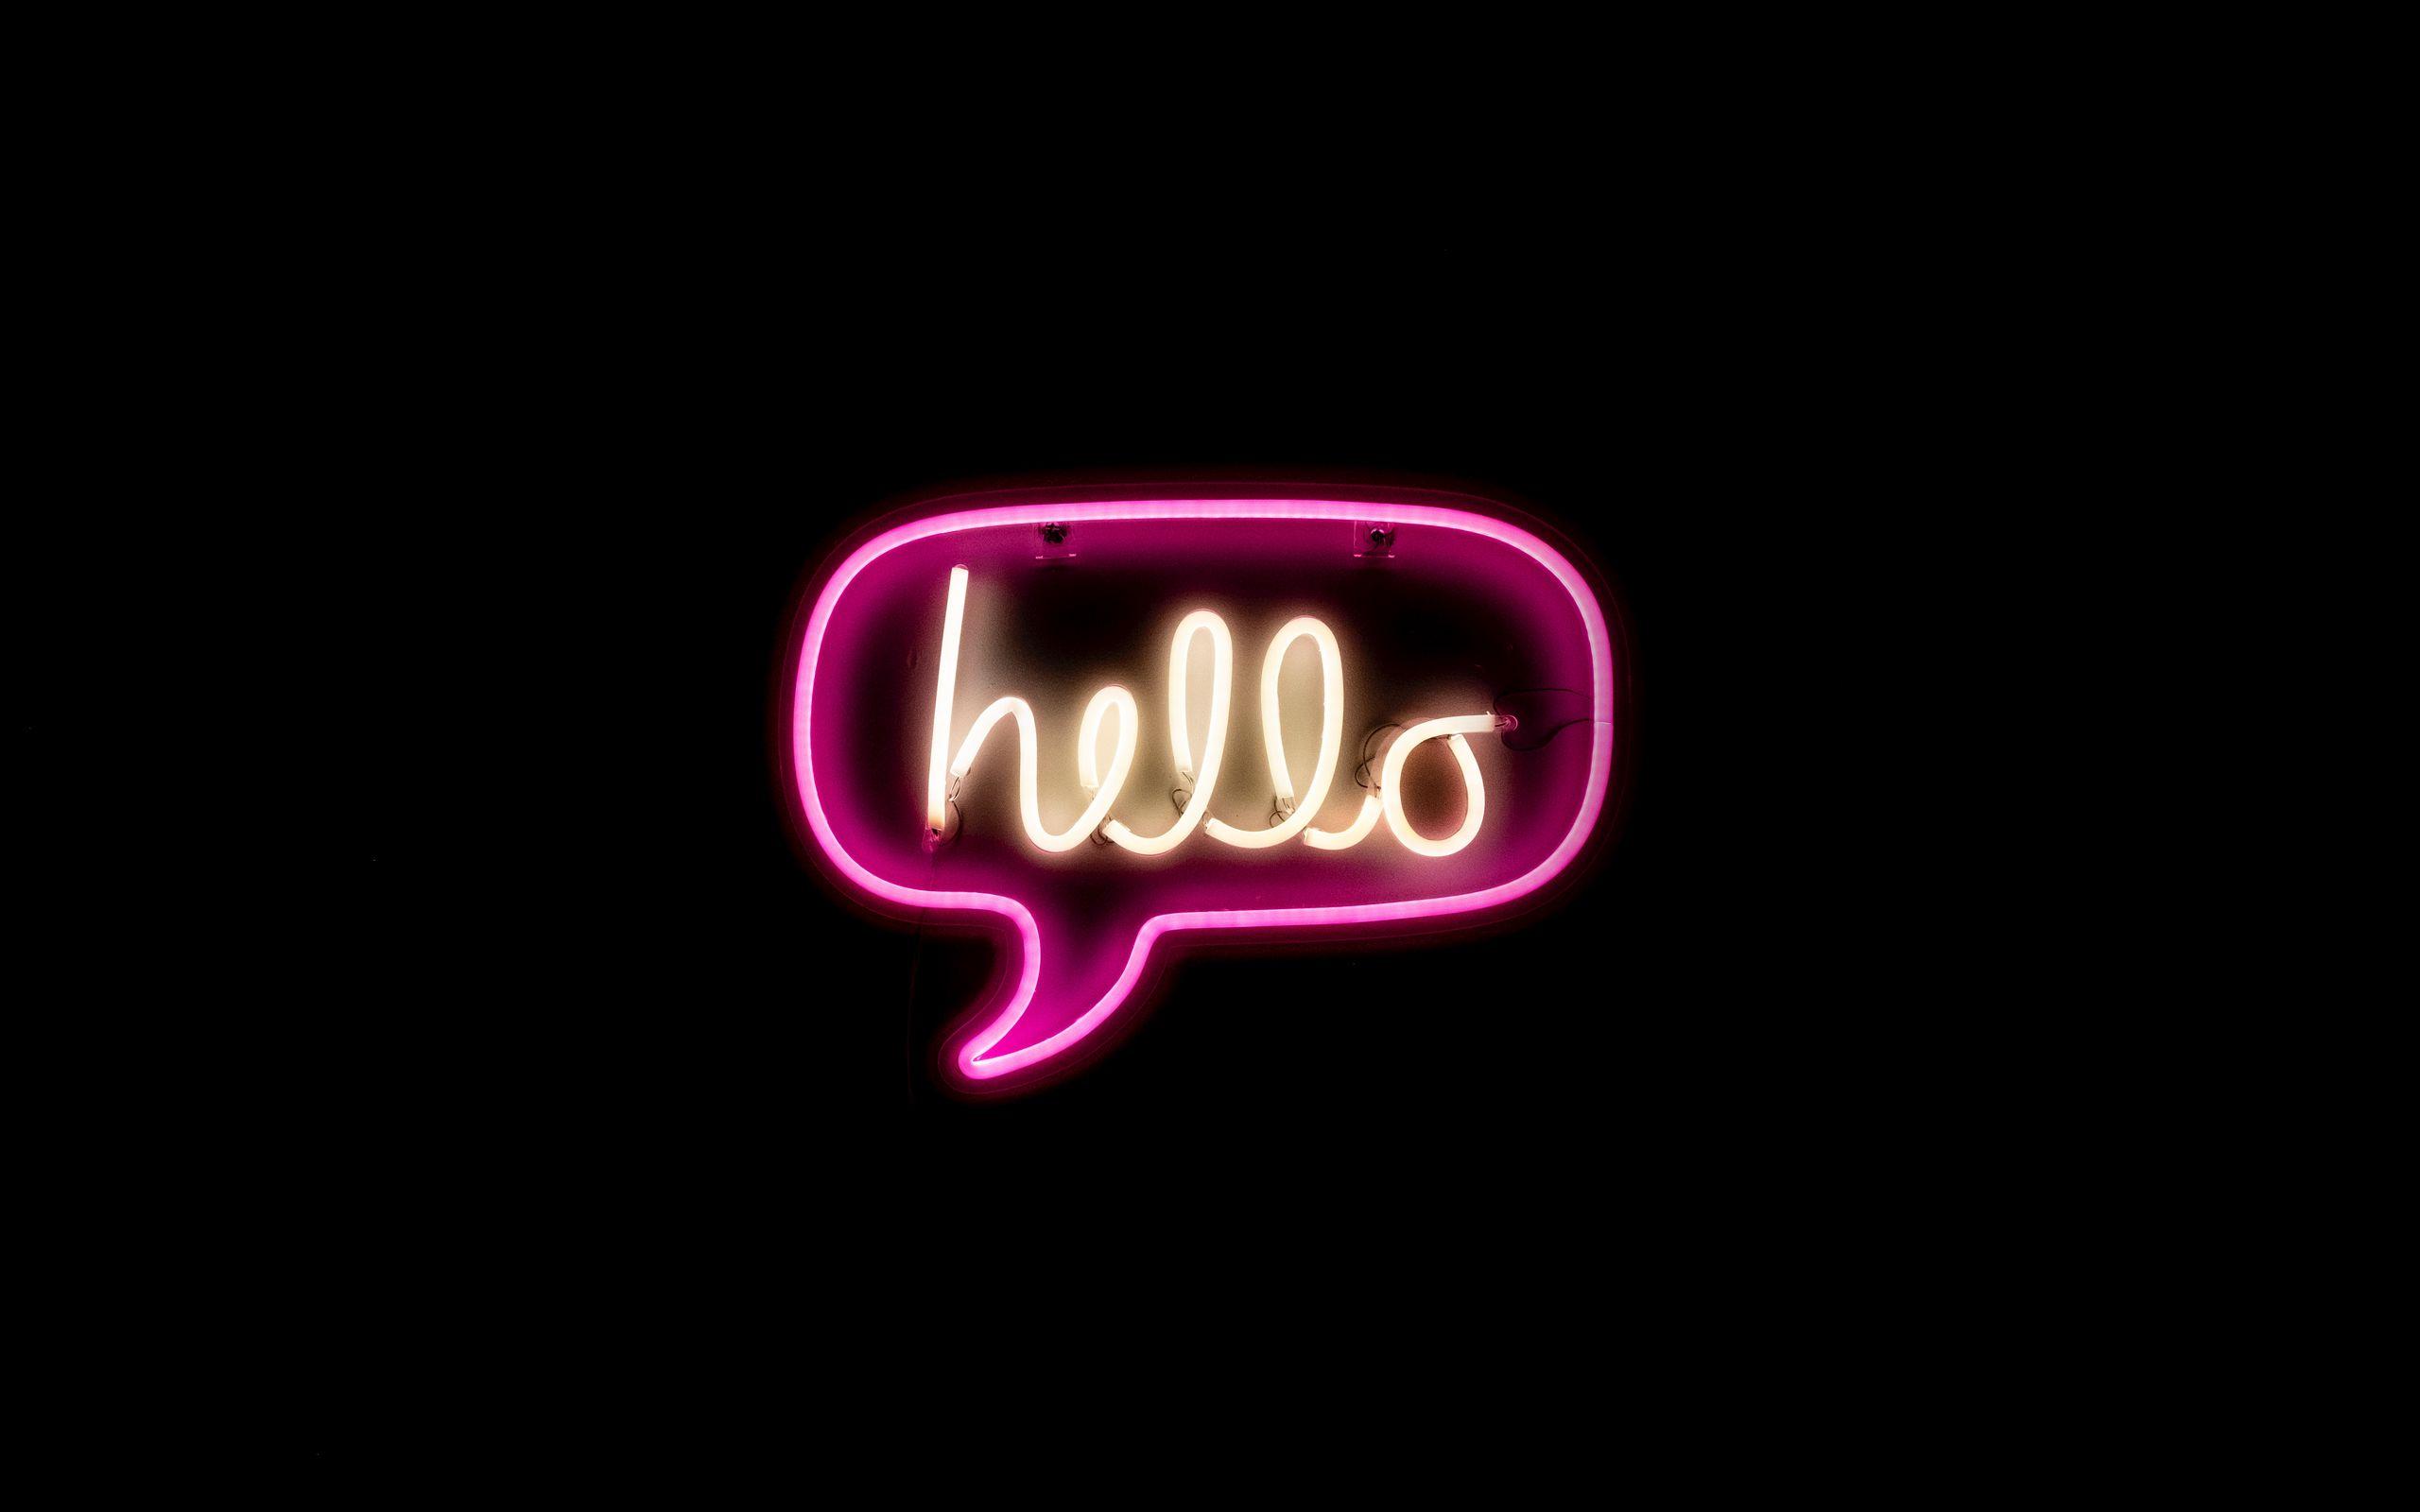 2560x1600 Wallpaper hello, neon, inscription, text